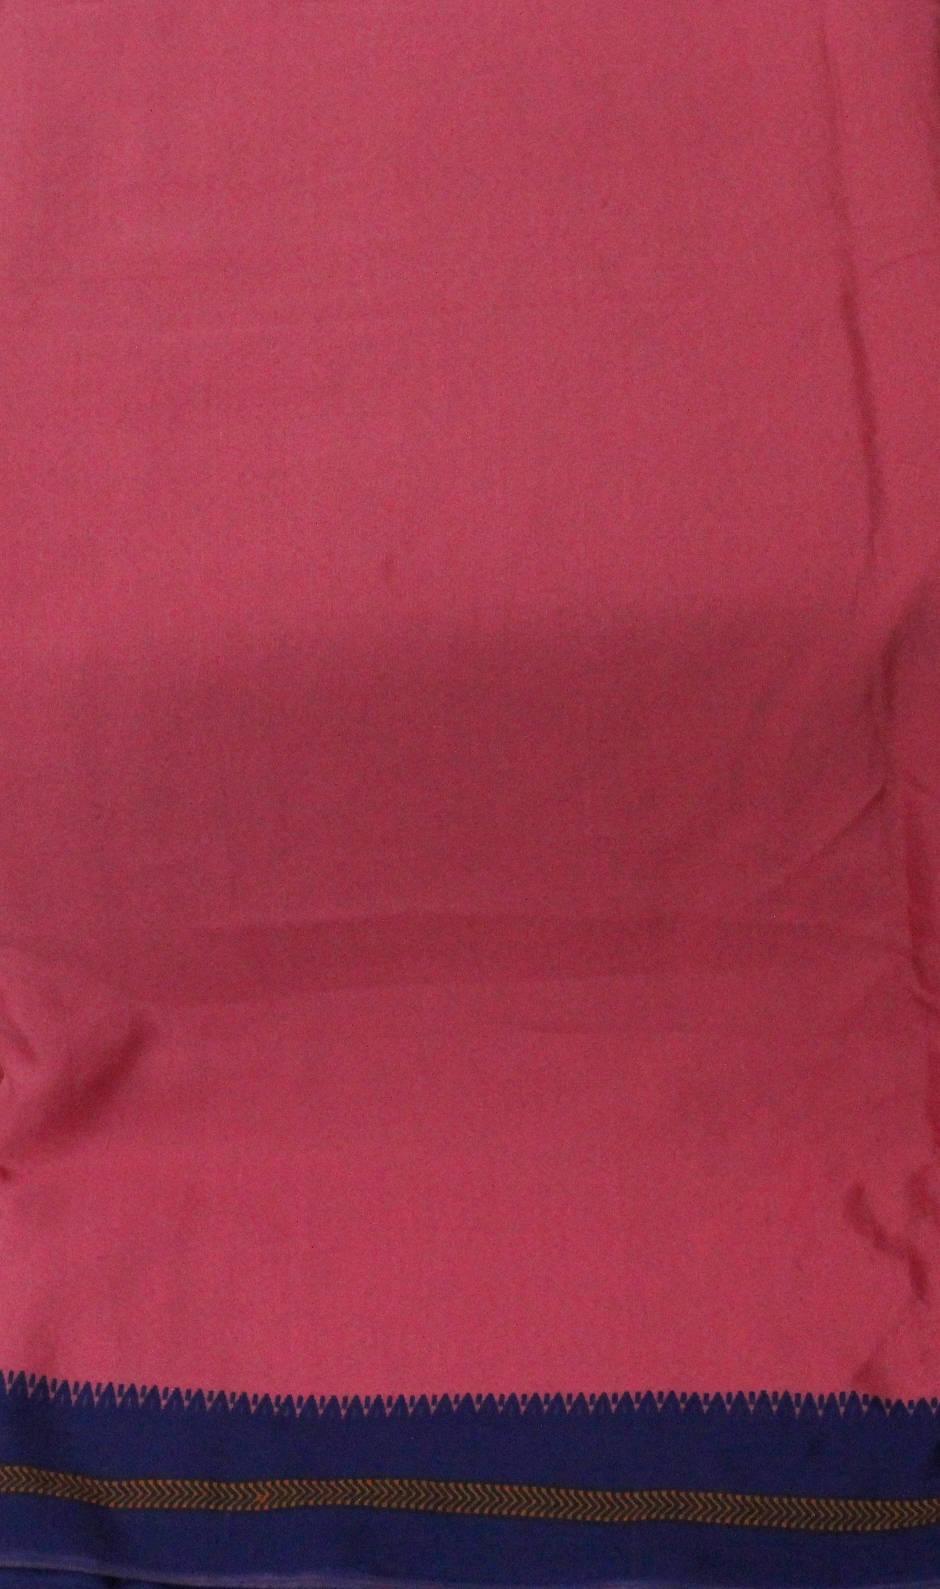 Multicolor Indian Vintage Women Clothing Fabric Beautiful fine Design Notion Craft Fabric Beautiful Piece.